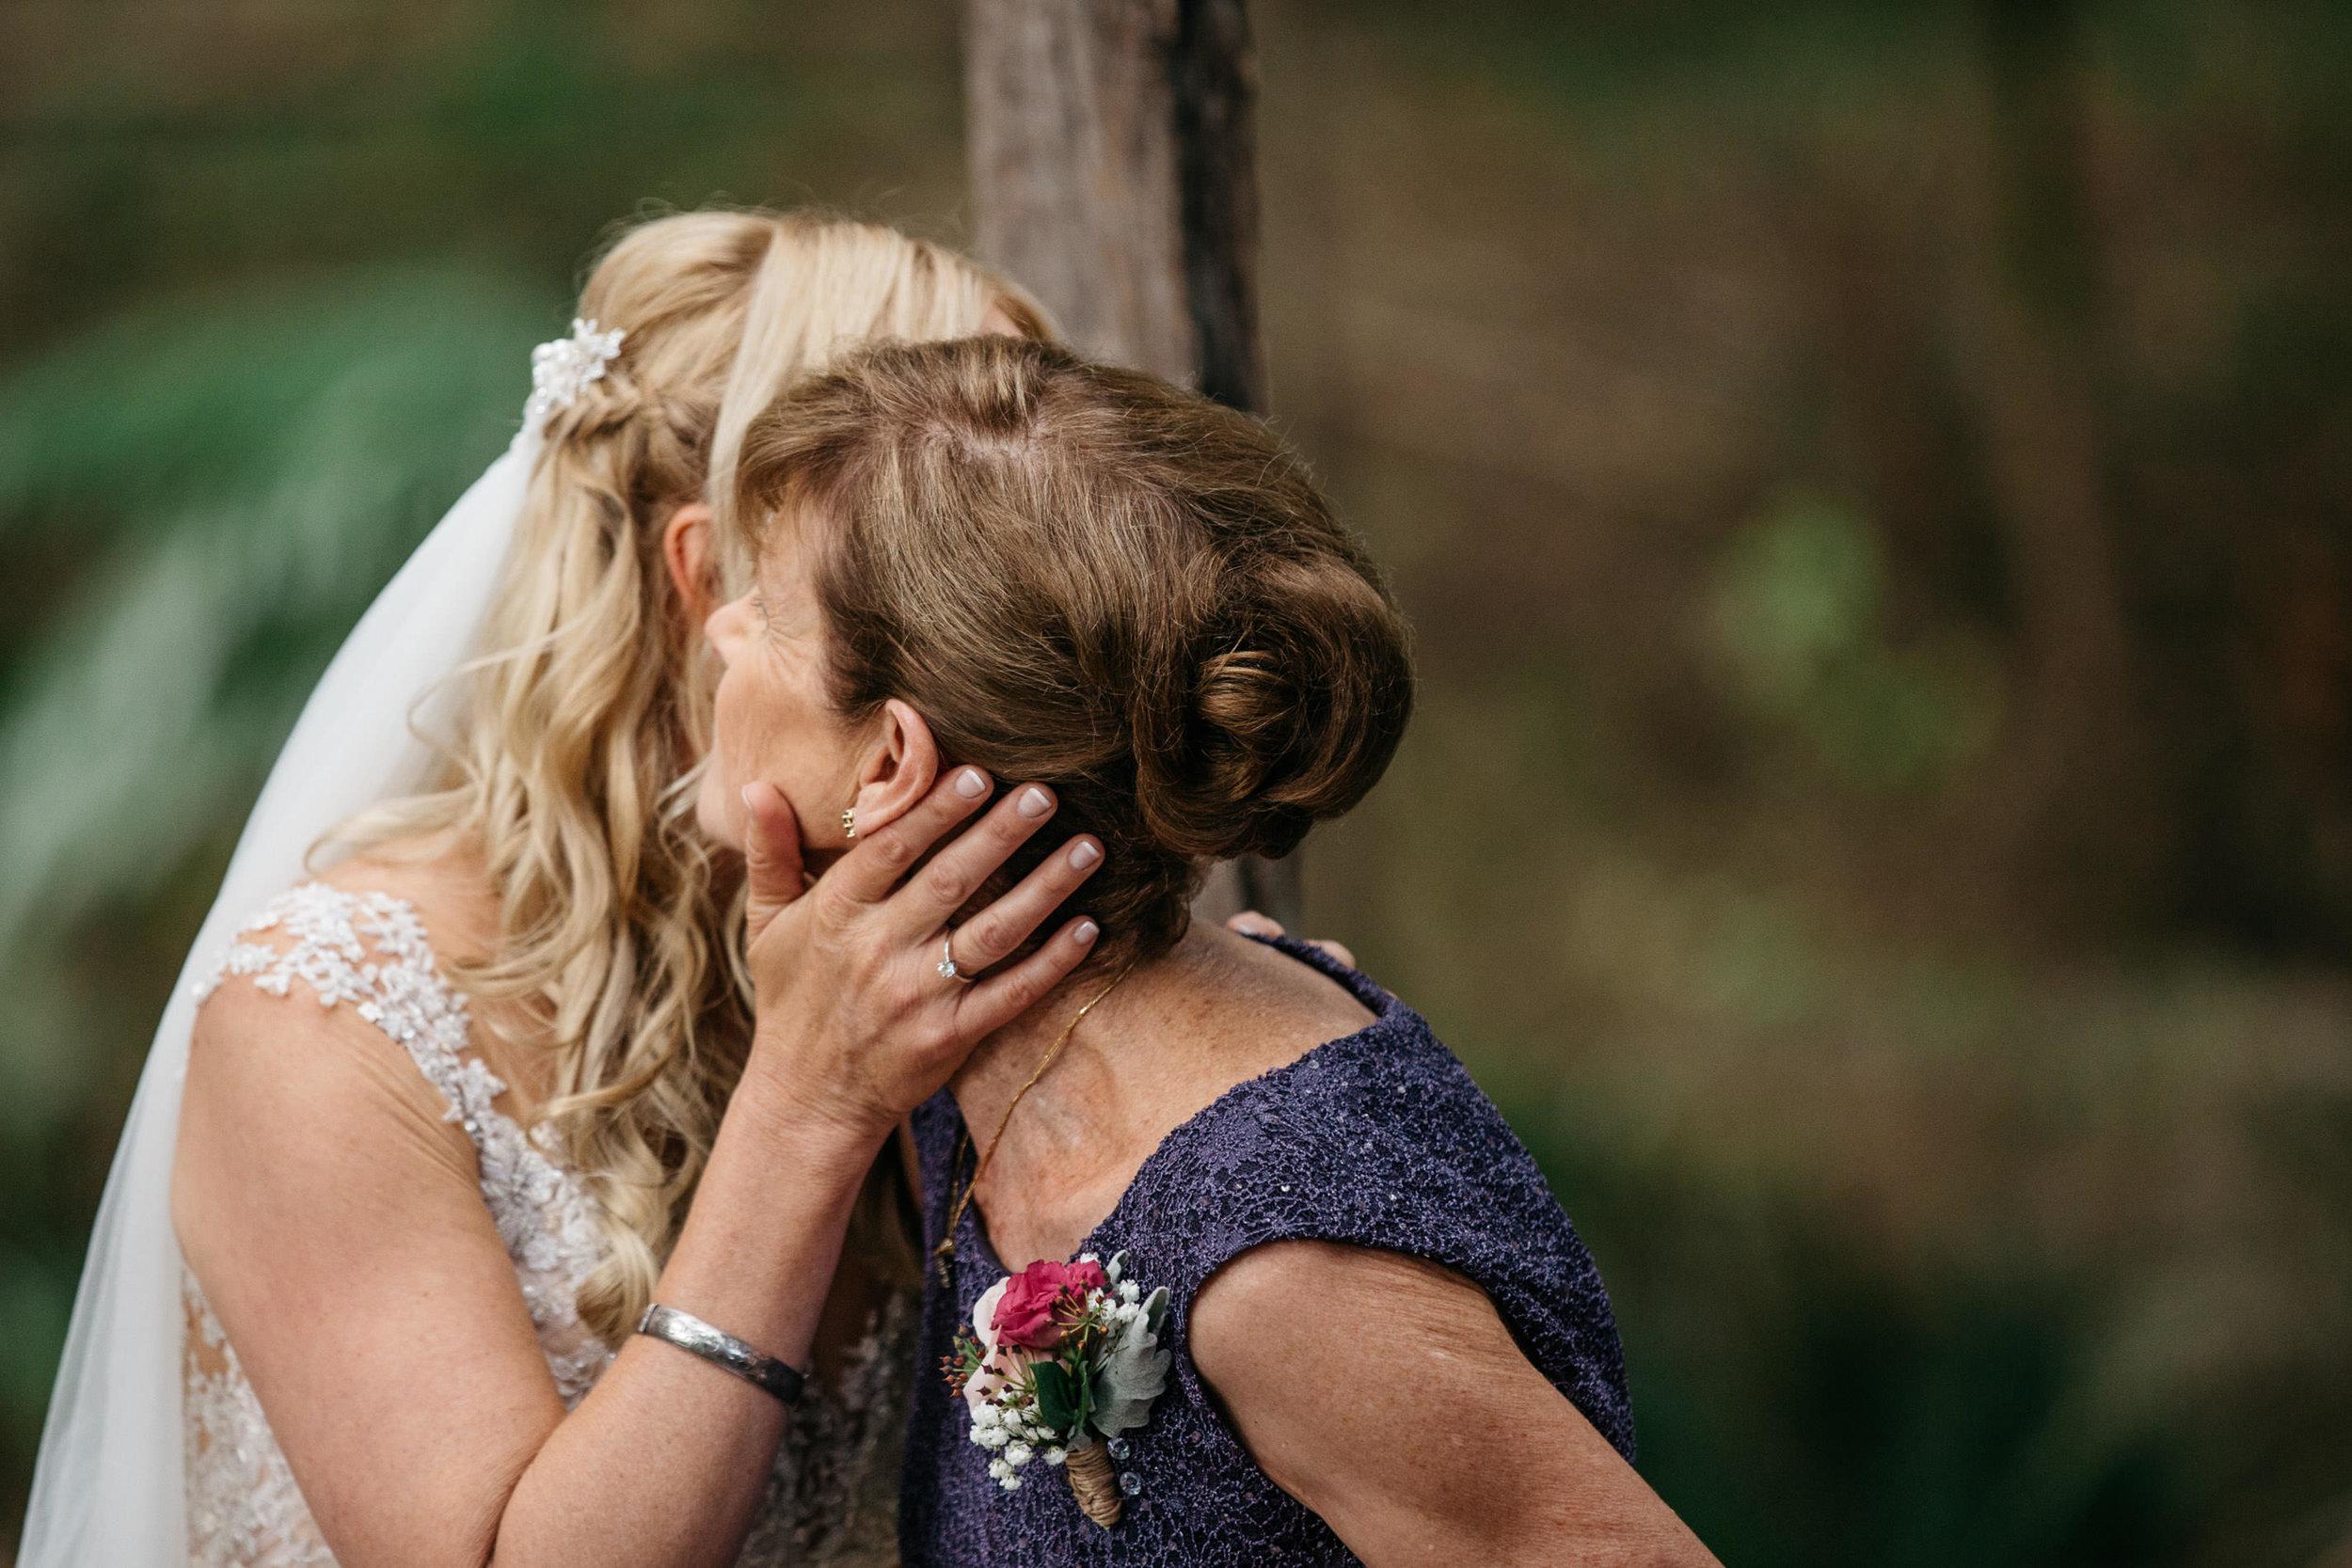 True North Photography_Boomerang Farm_Stacey and Isaac_Gold Coast Wedding_Barm Wedding_Hinterland Wedding-92.jpg